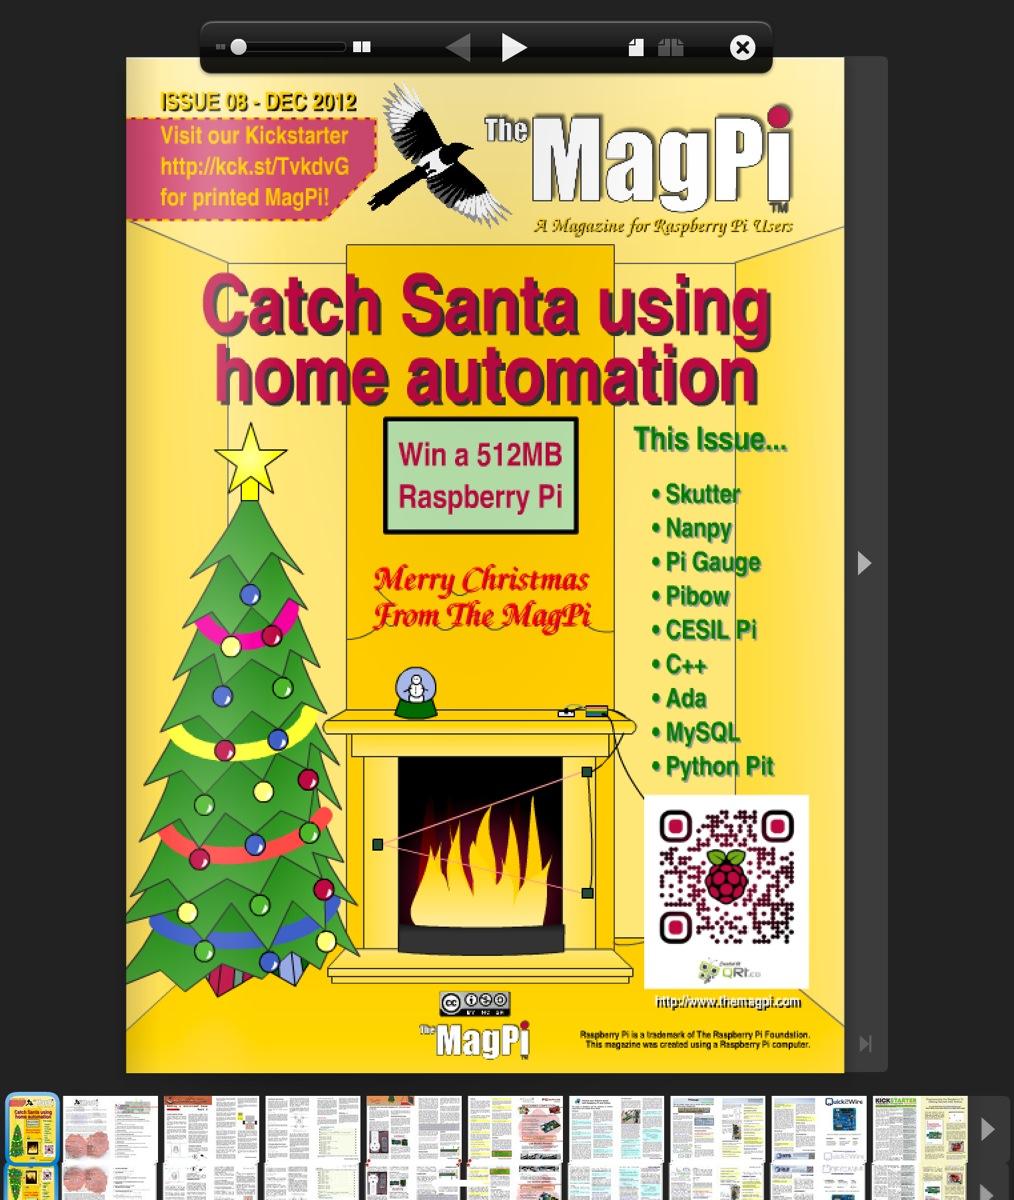 DecemberMagPiMagazine